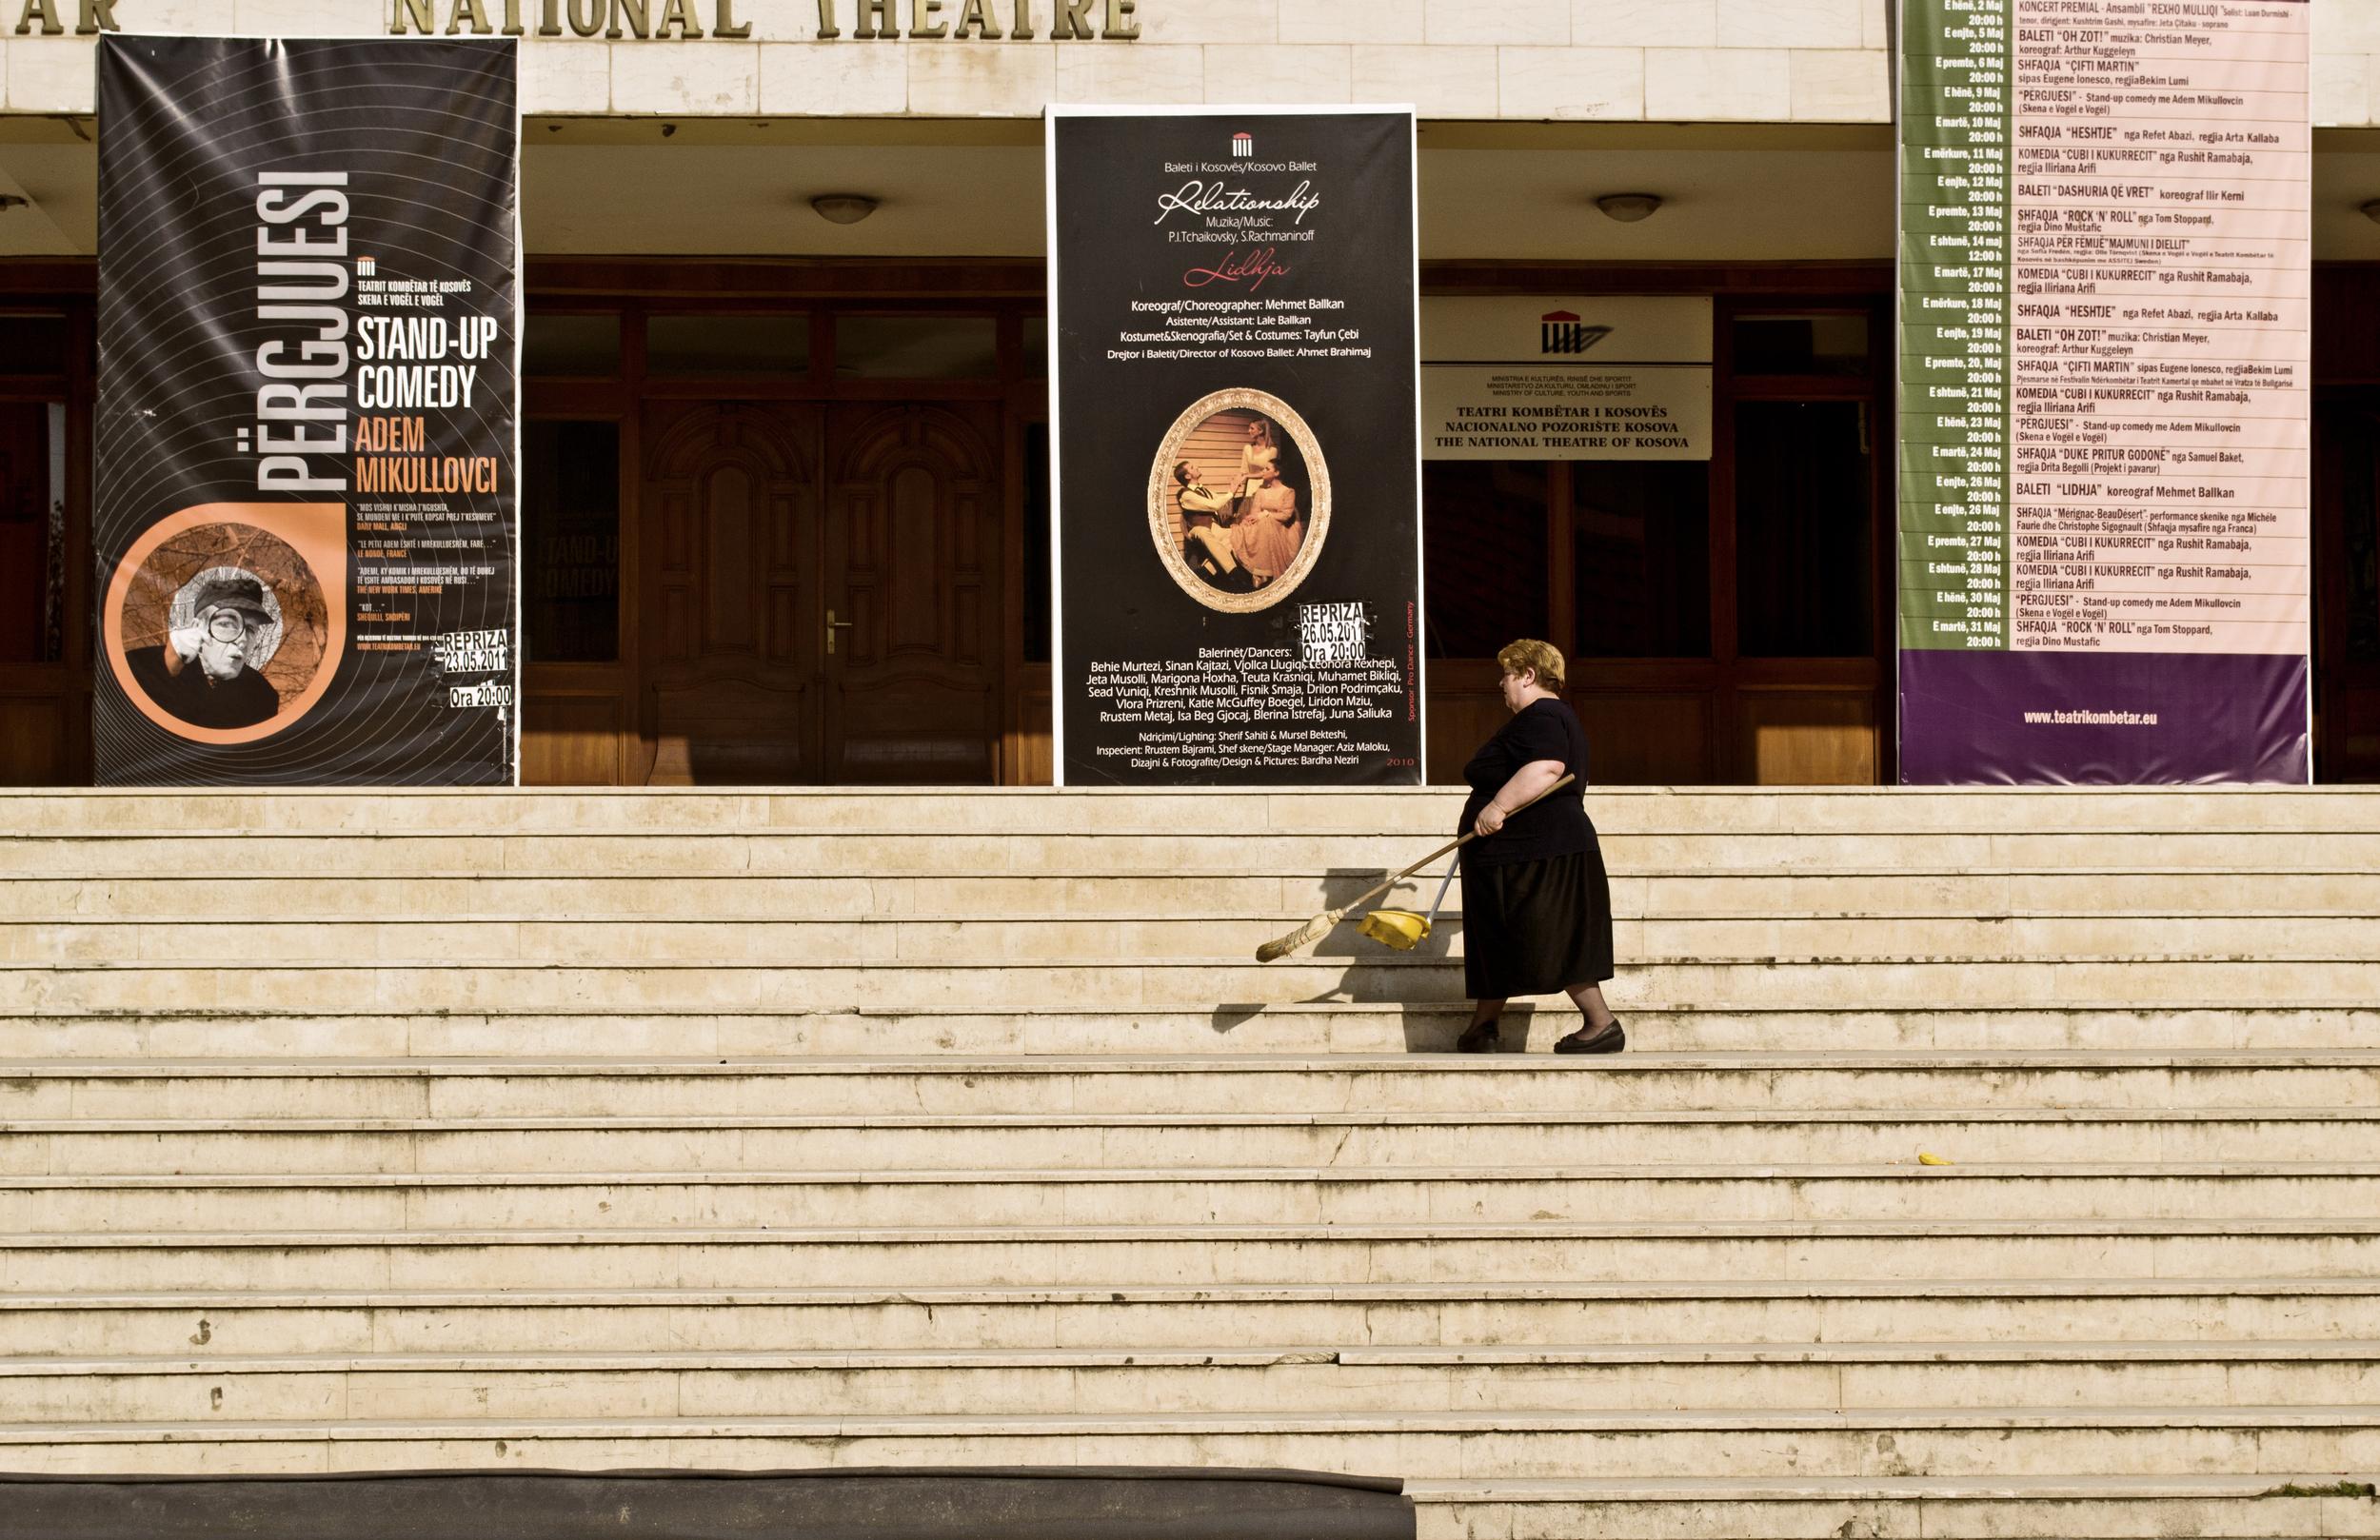 HM6Pristina-NationalTheater.jpg